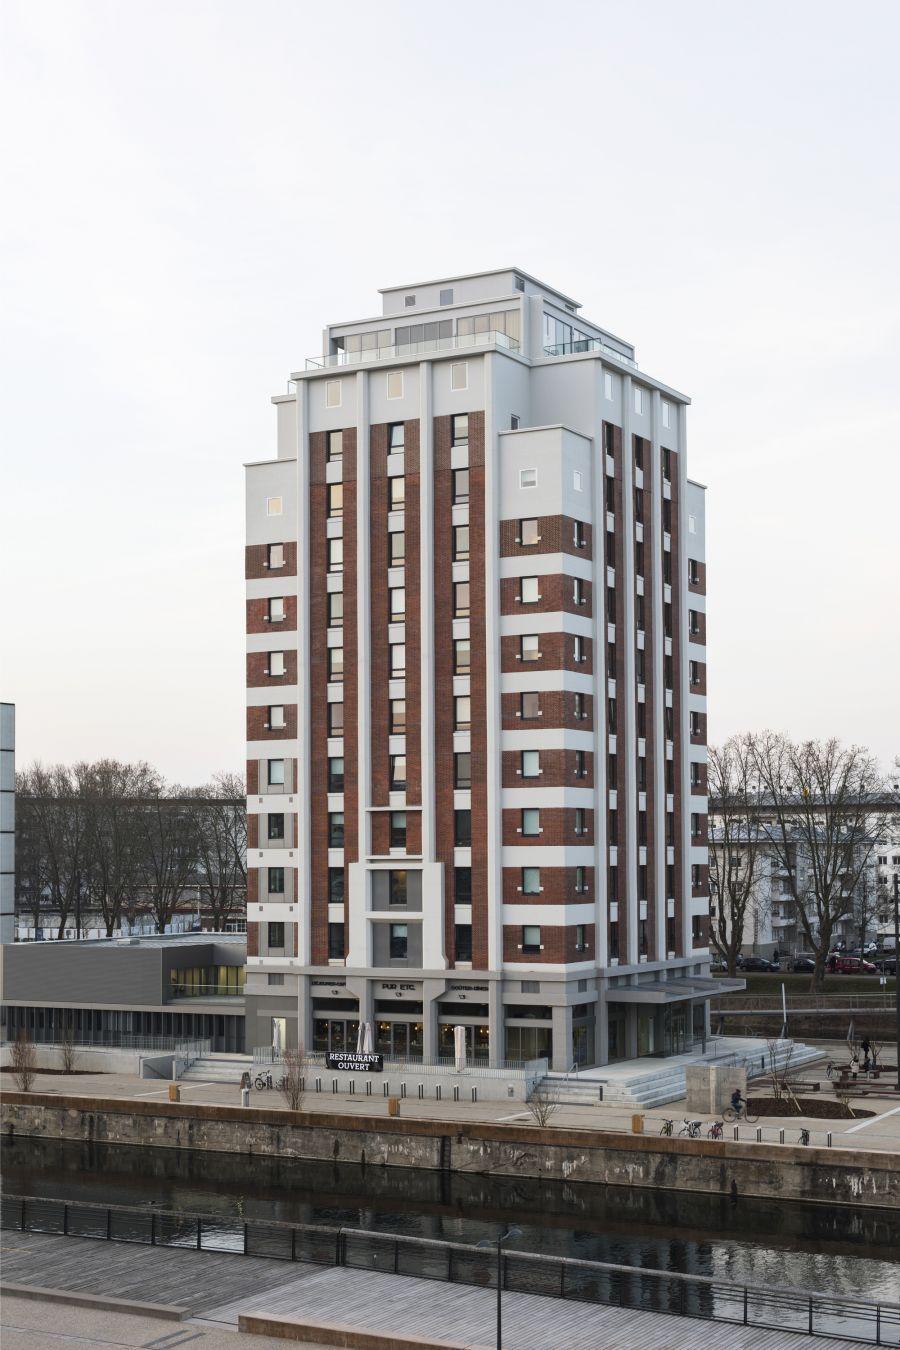 Maison Universitaire Internationale - Arch. Weber Keiling Architectes - Photos : Florian Tiedje